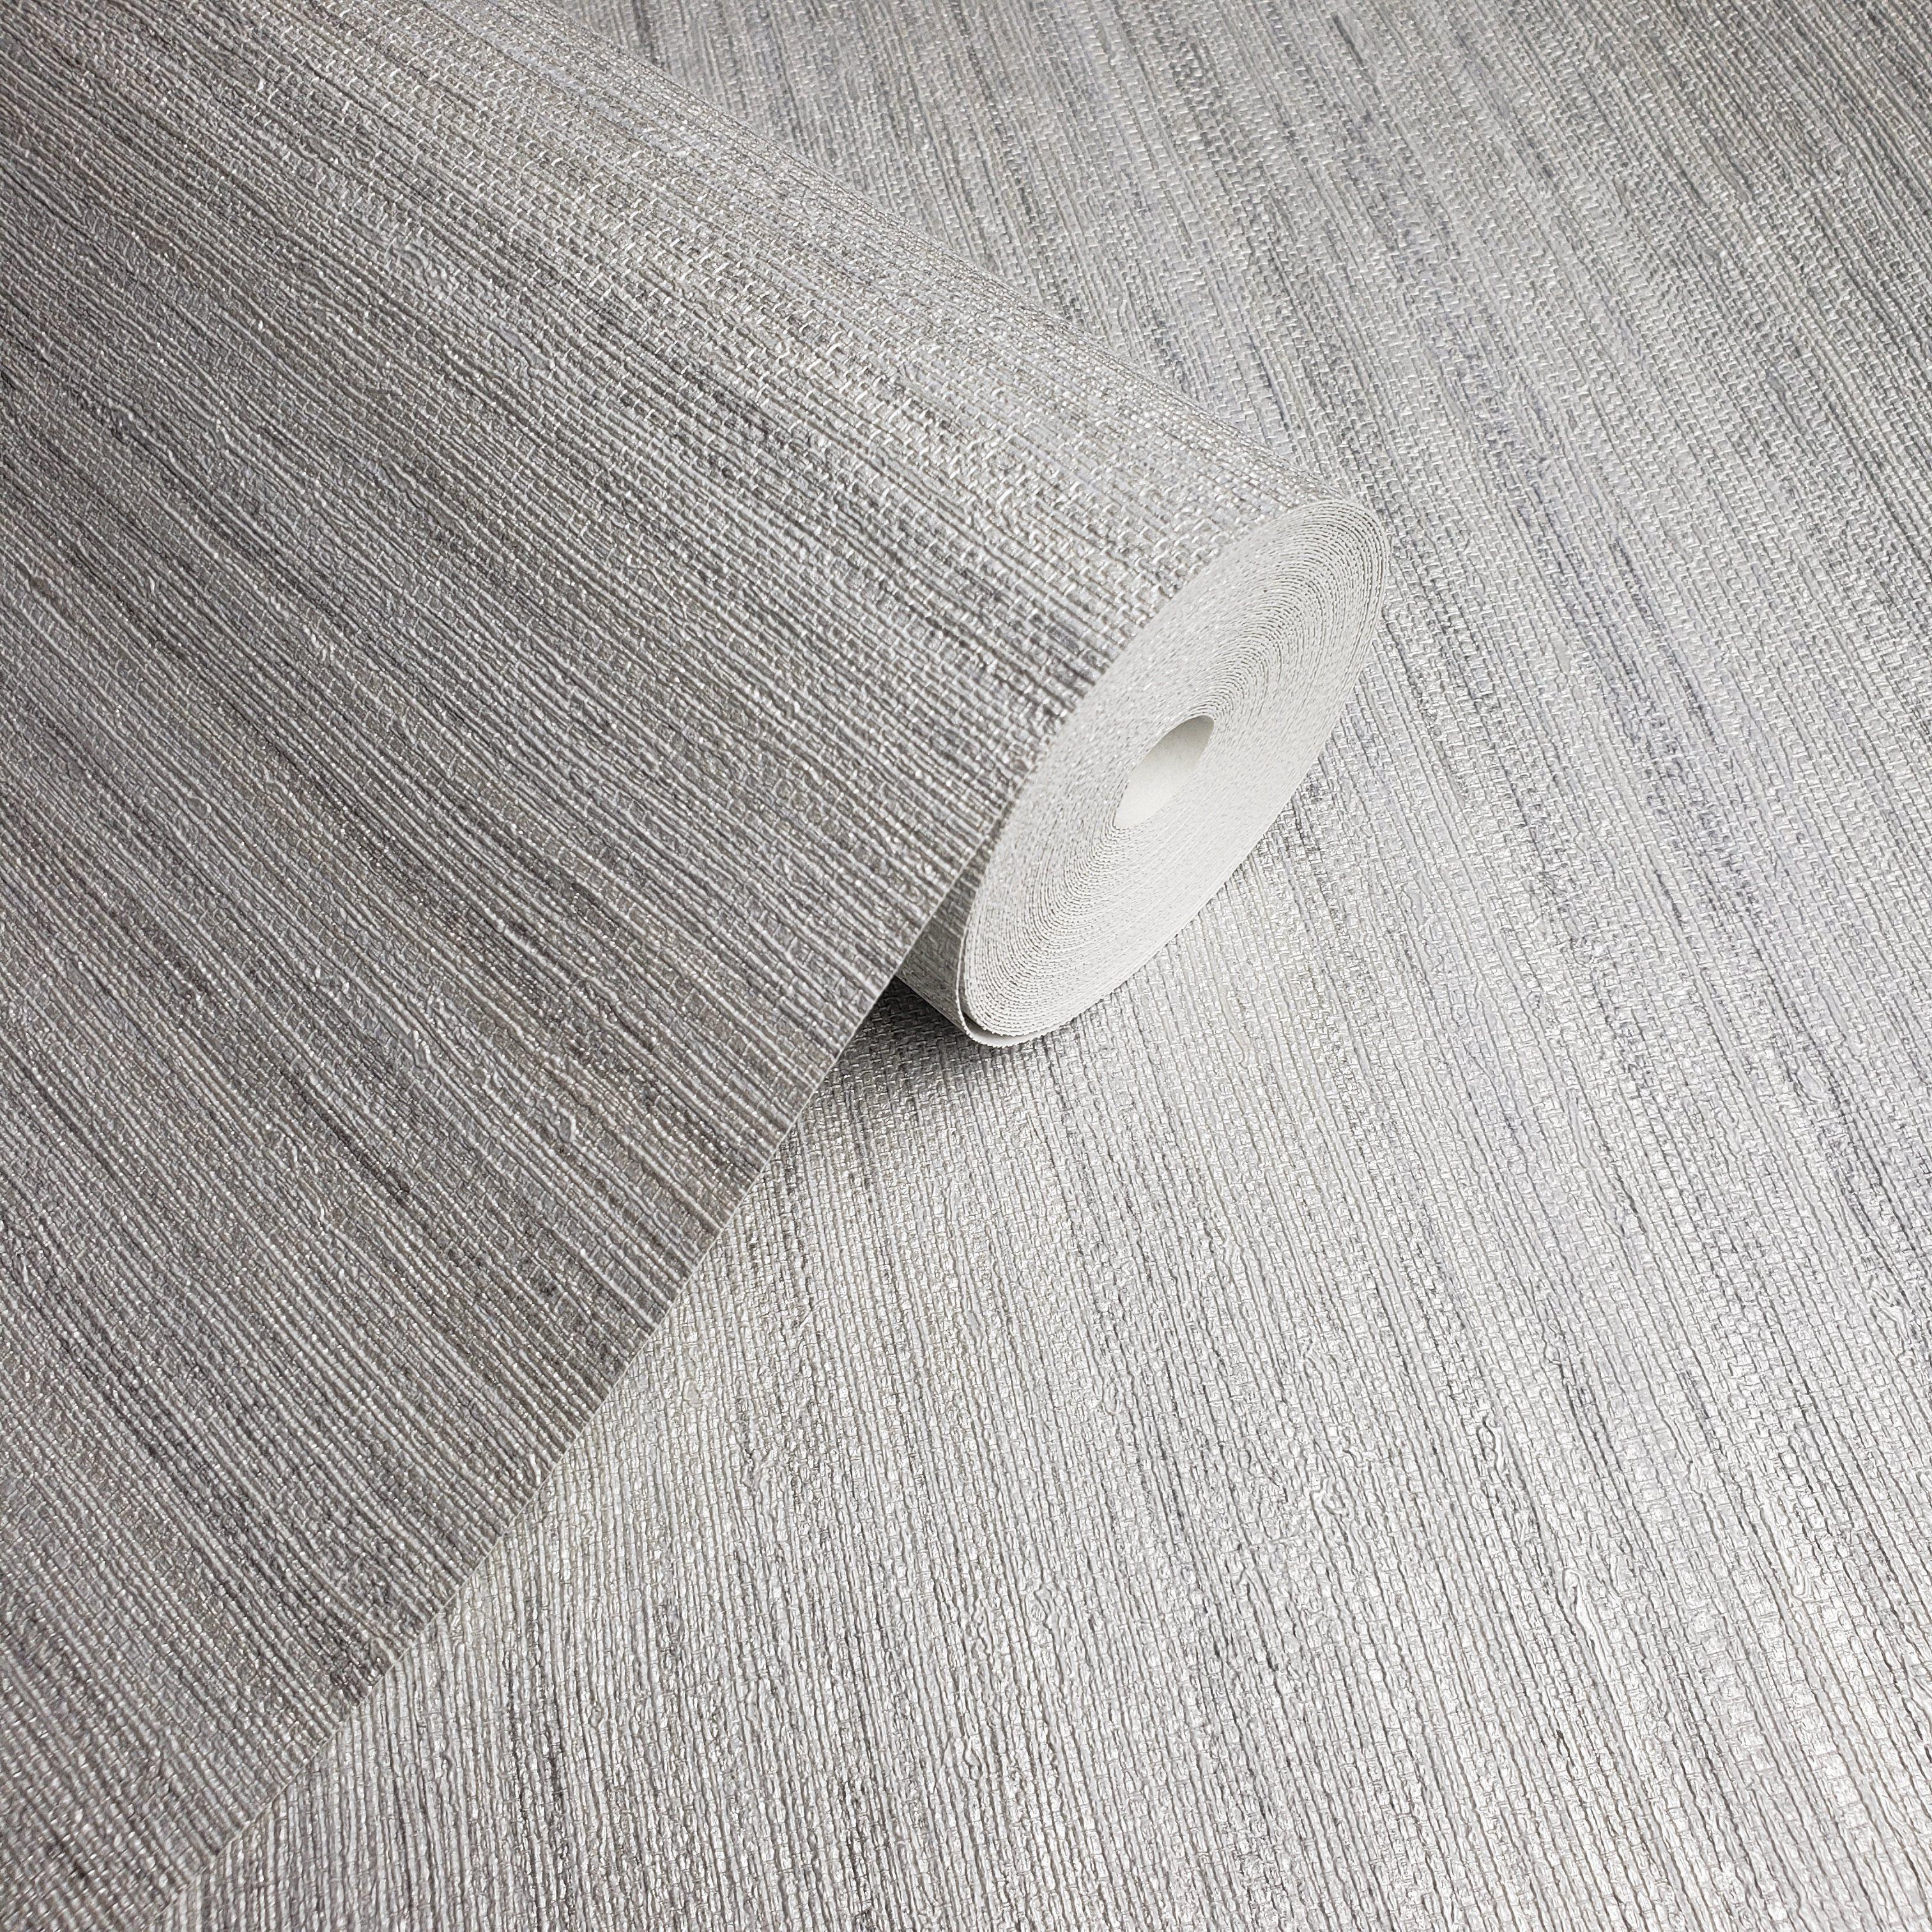 WM8800801 Modern Wallpaper Rustic Gray Silver metallic